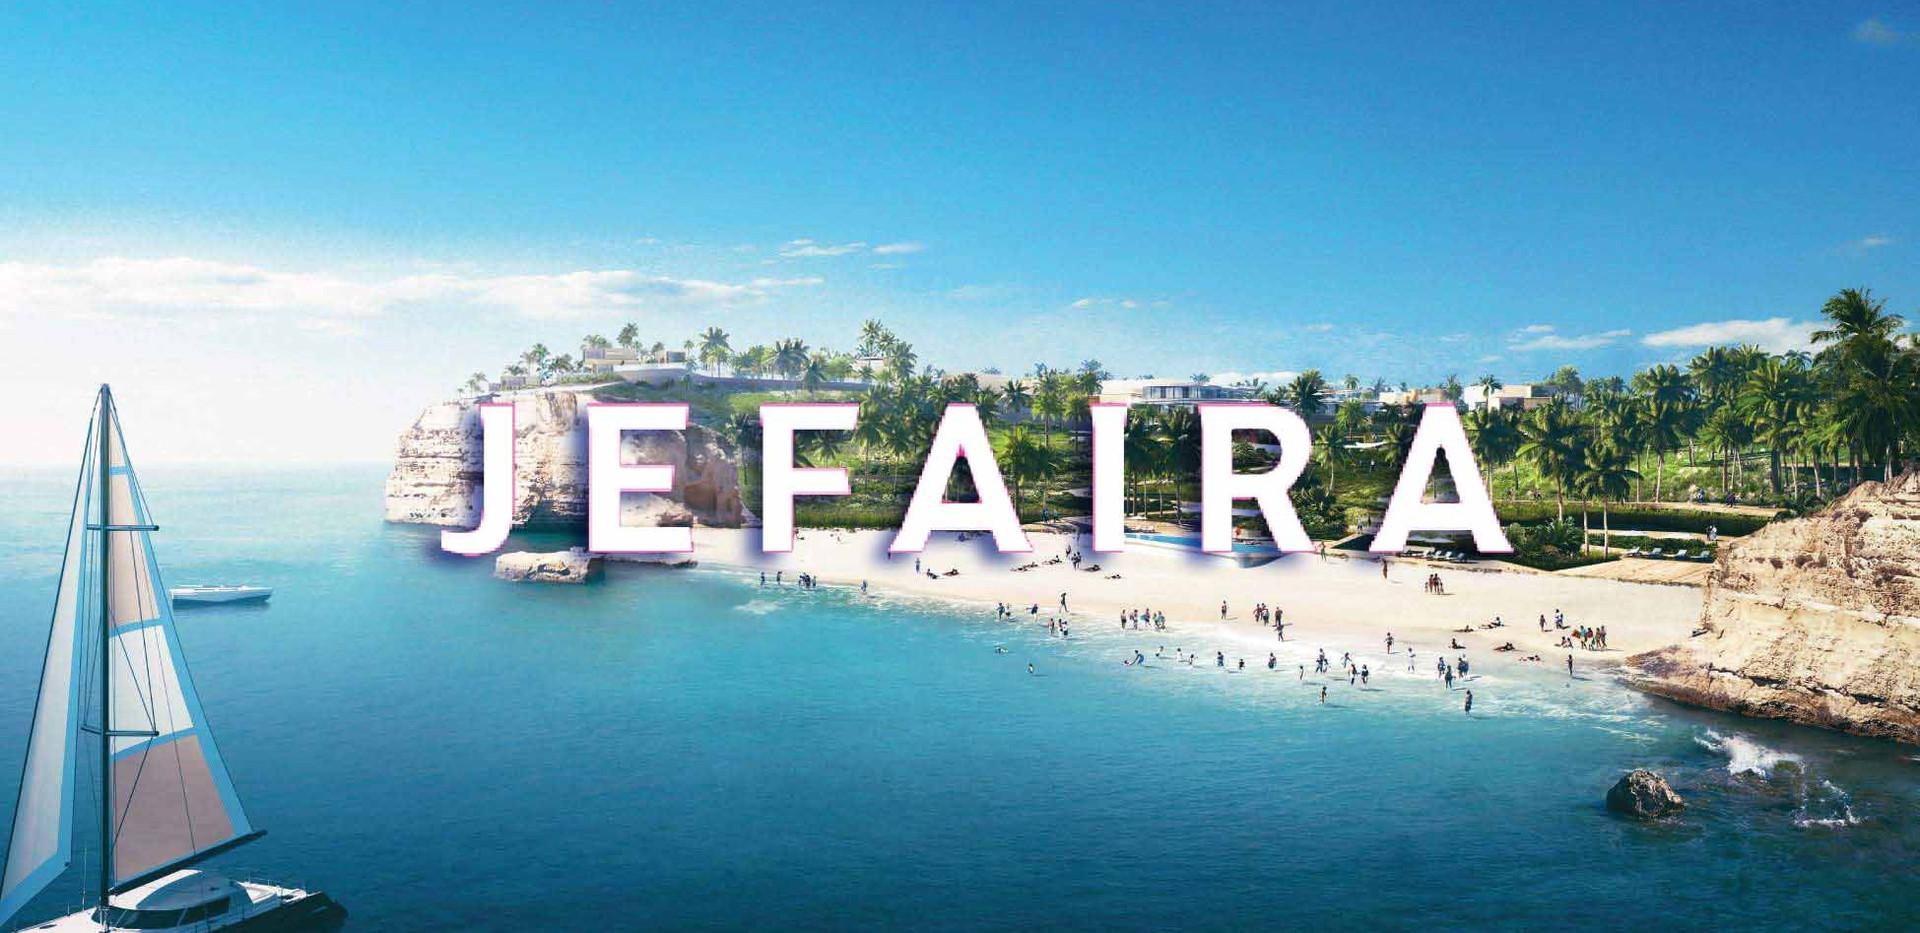 JEFAIRA - North Coast by Inertia